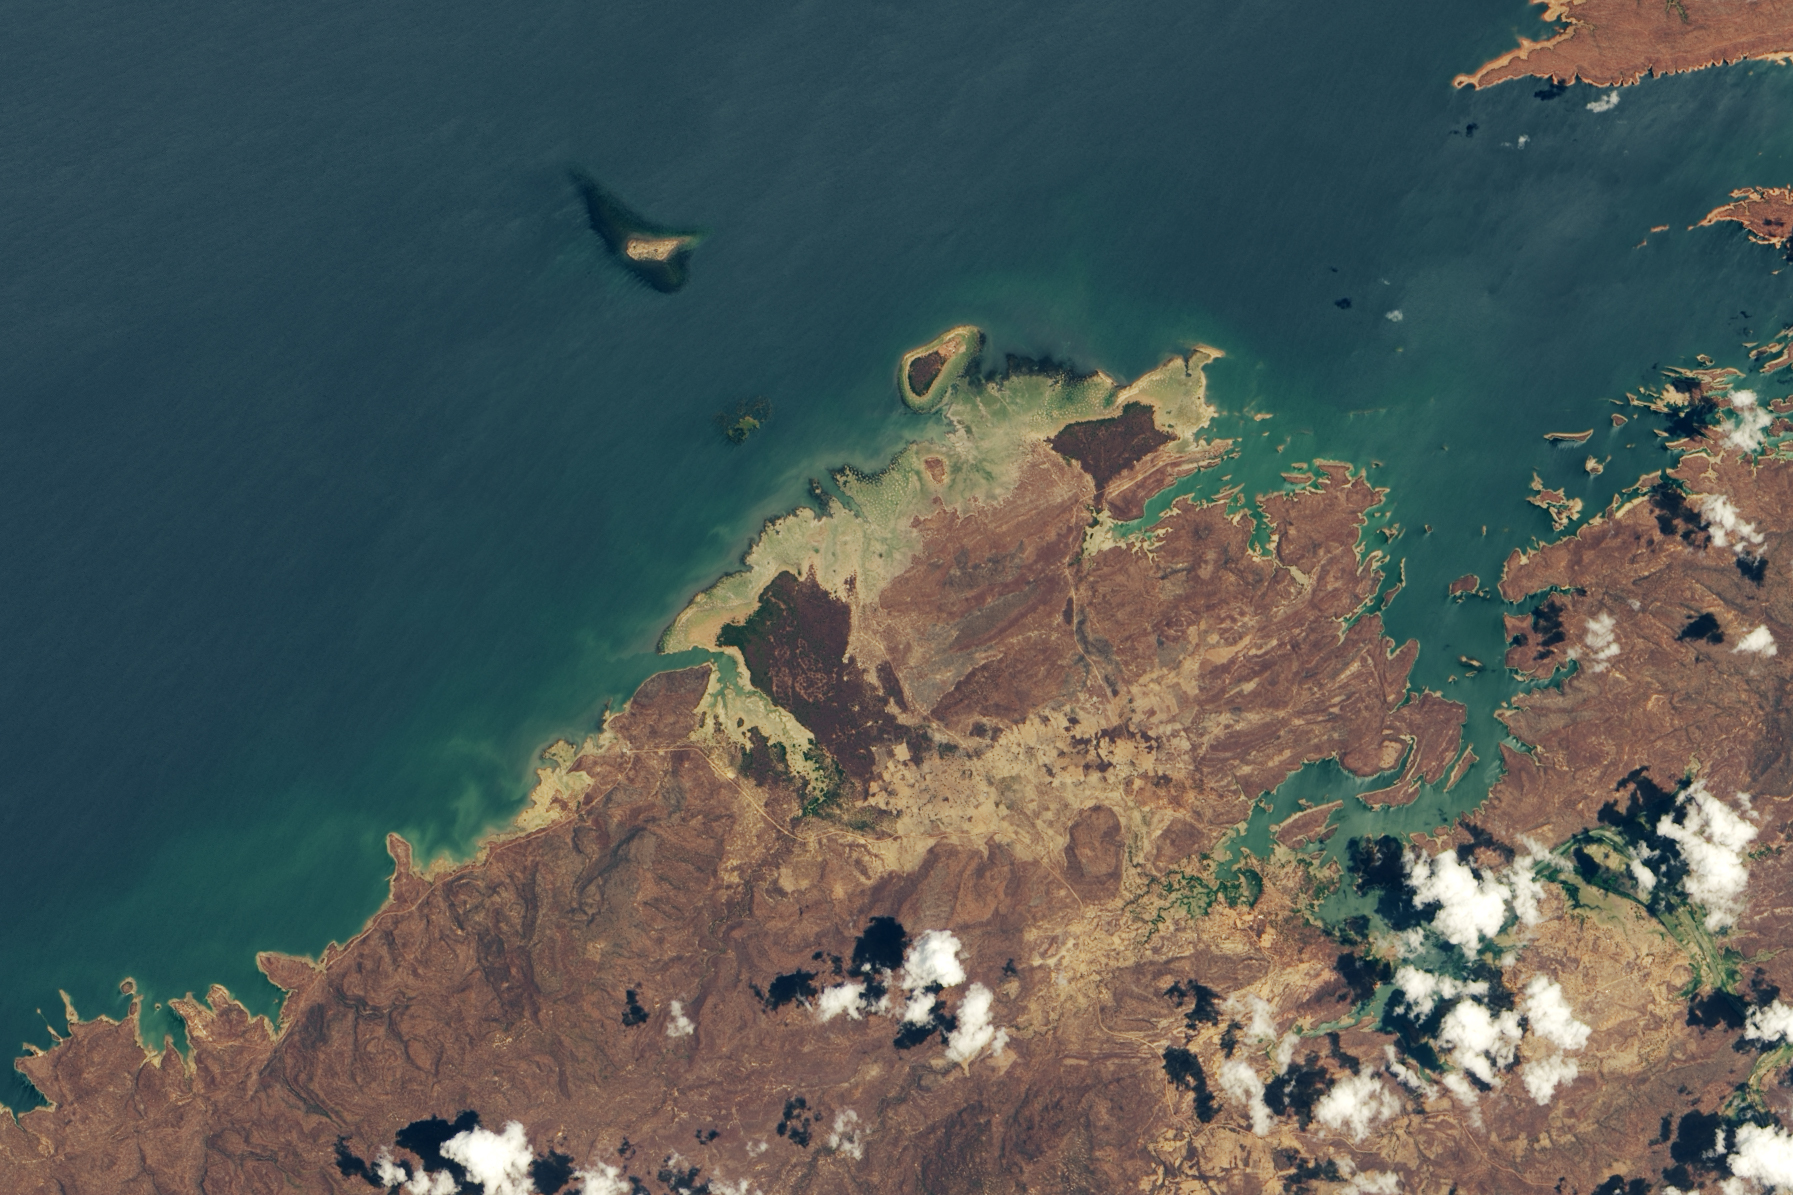 Water Levels Keep Falling at Lake Kariba - related image preview